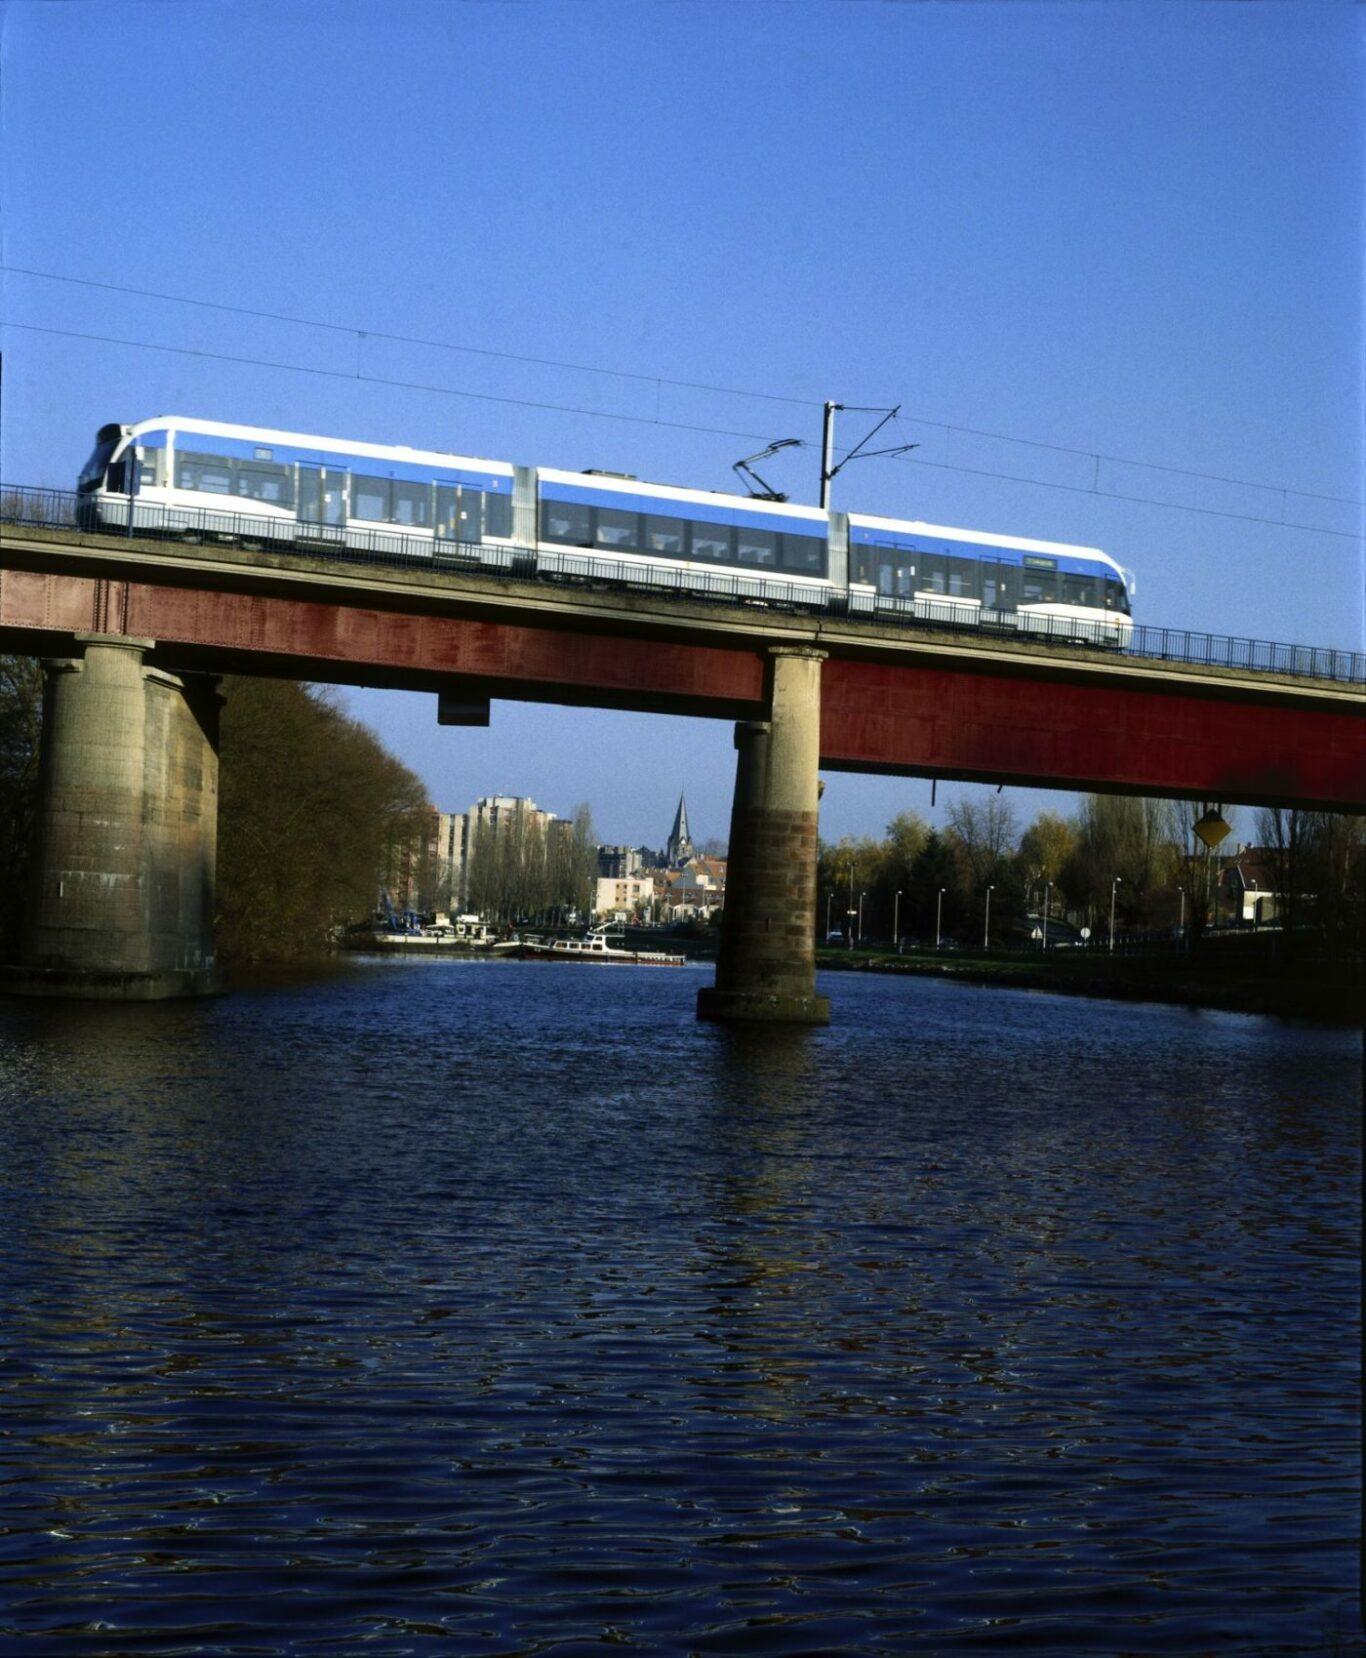 Saarbahn nach Sarreguemines